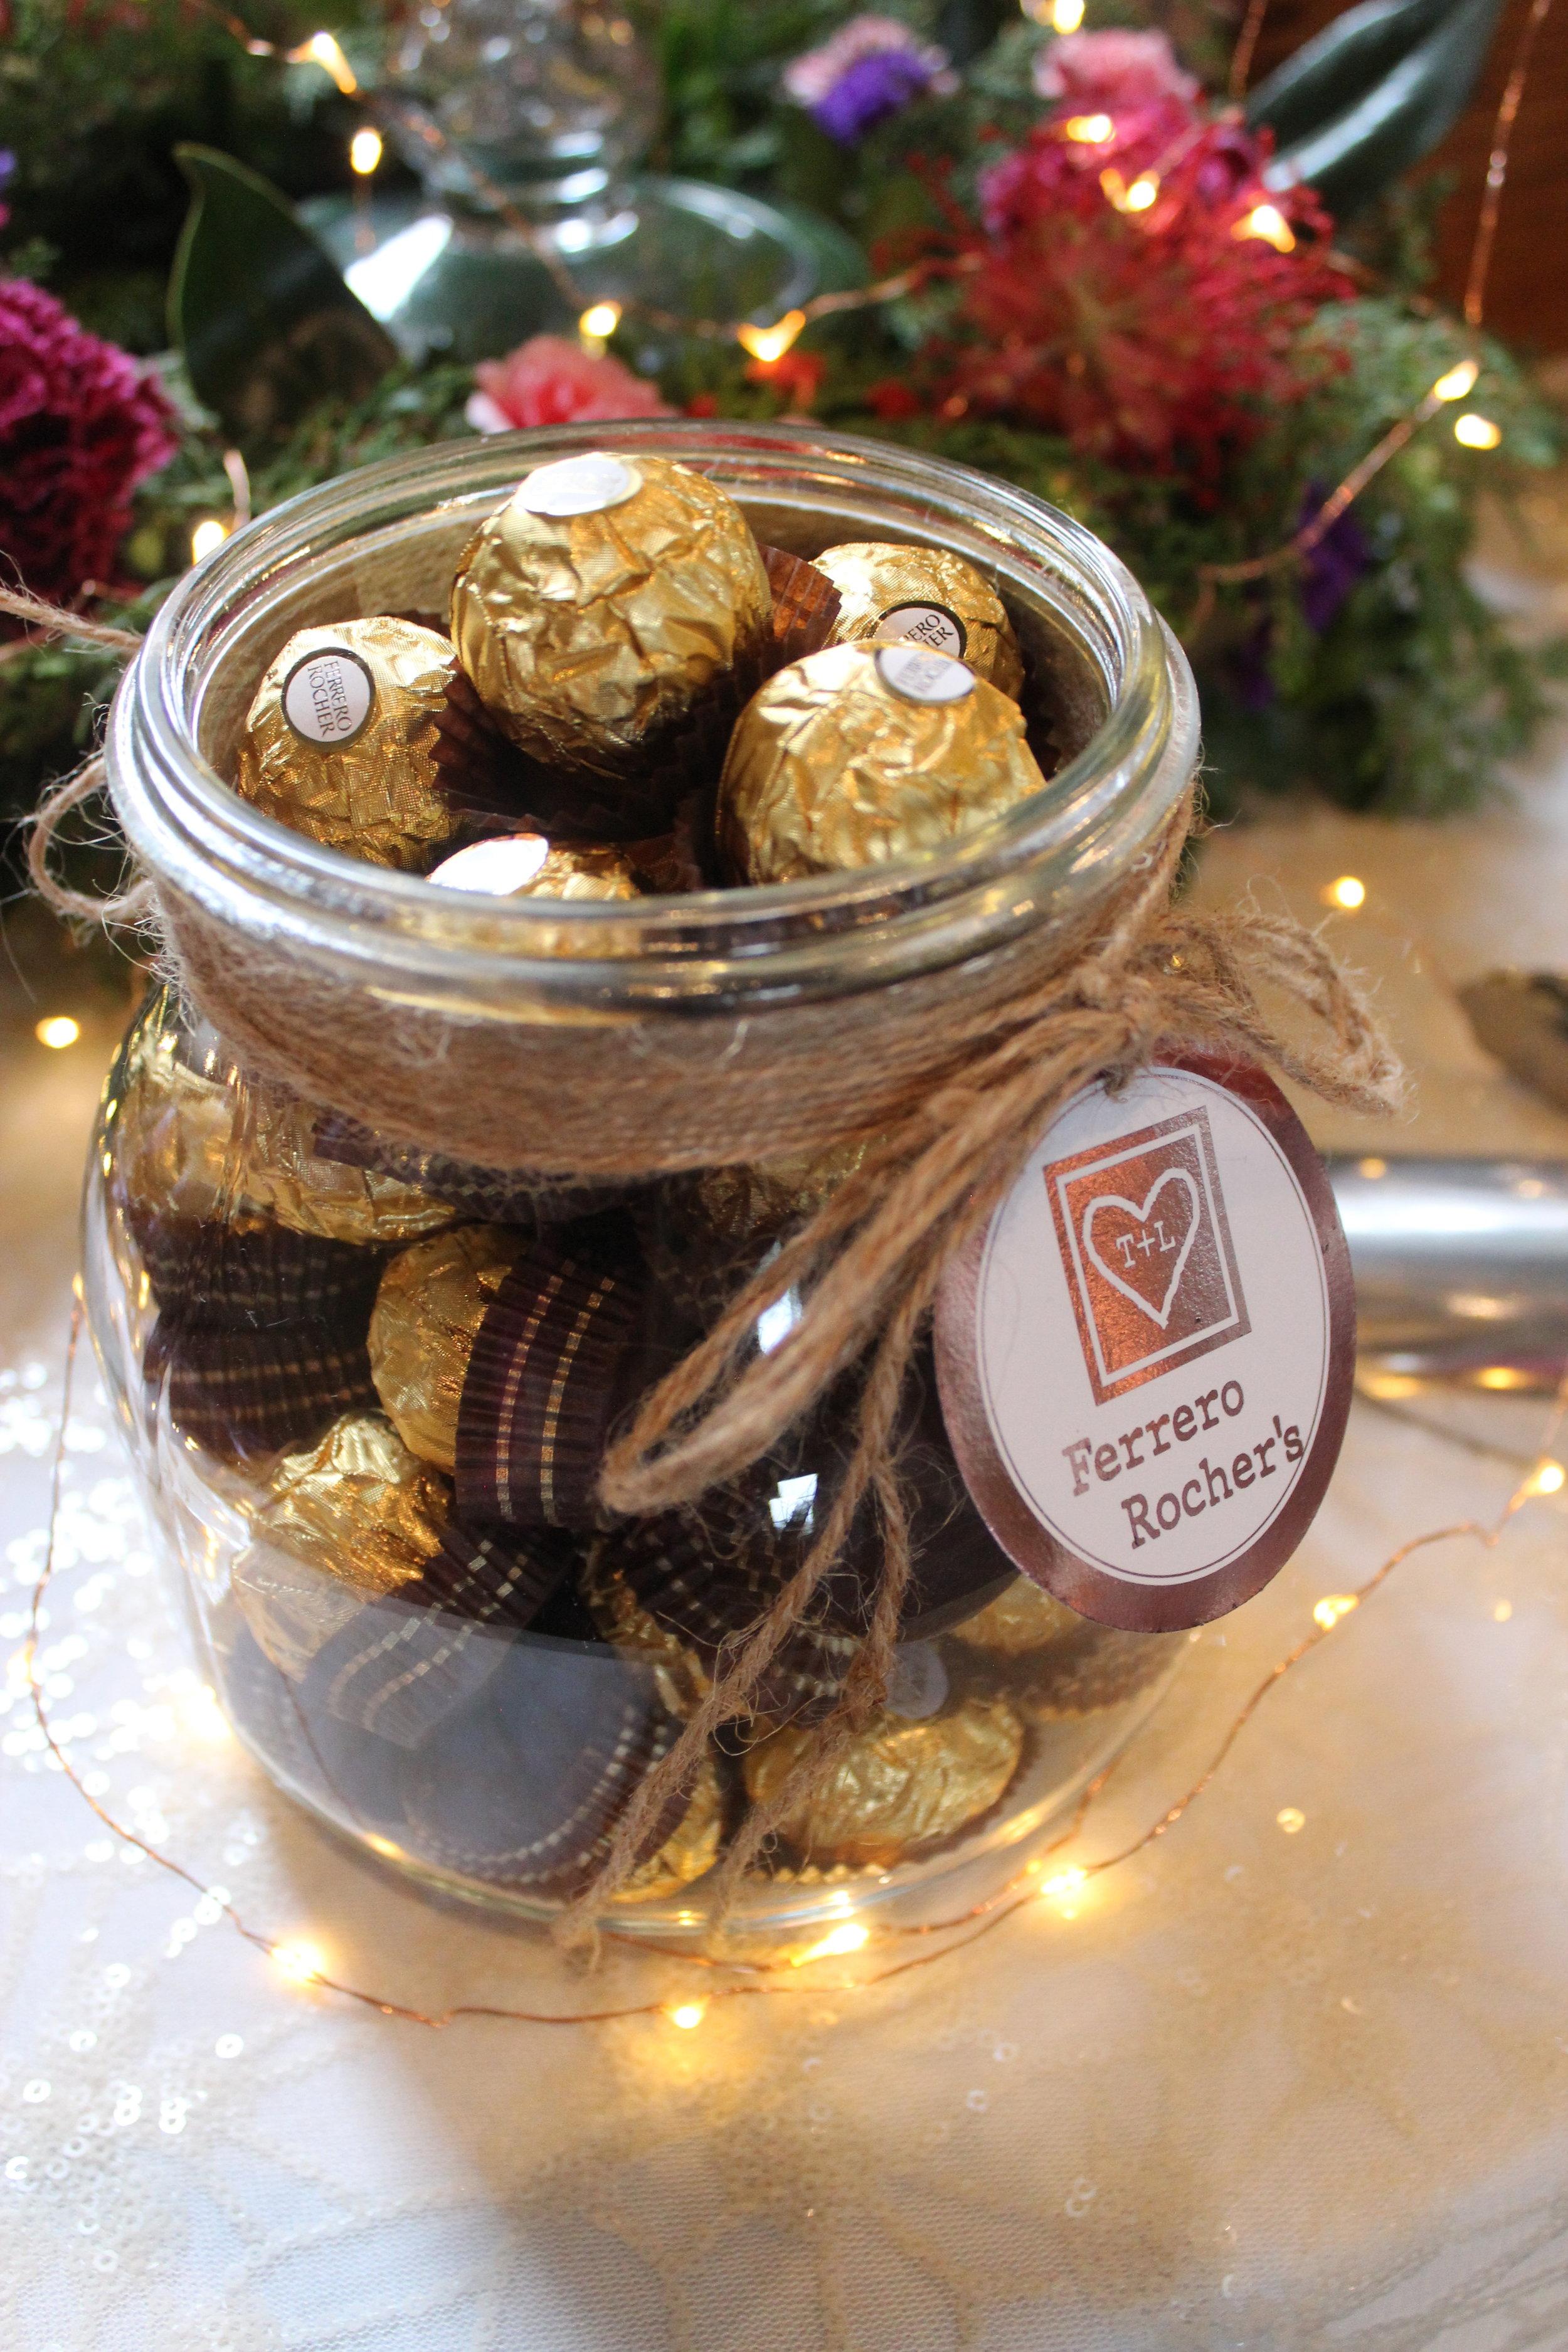 Ferrero Rocher's